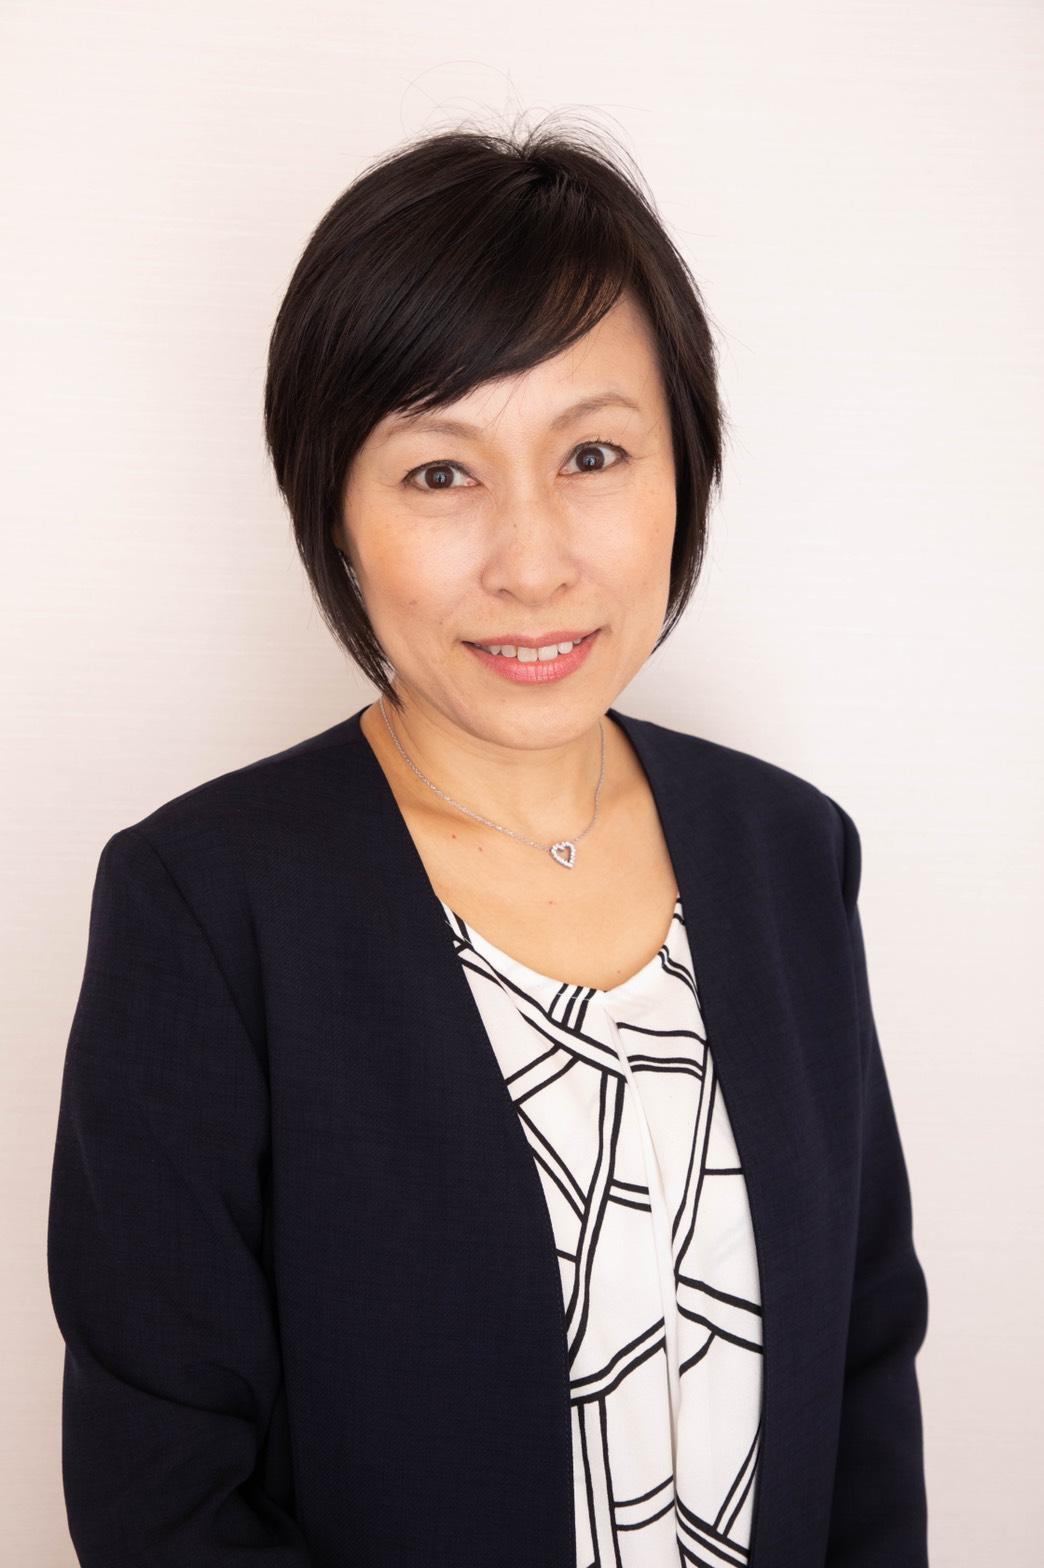 Mayumi Tani